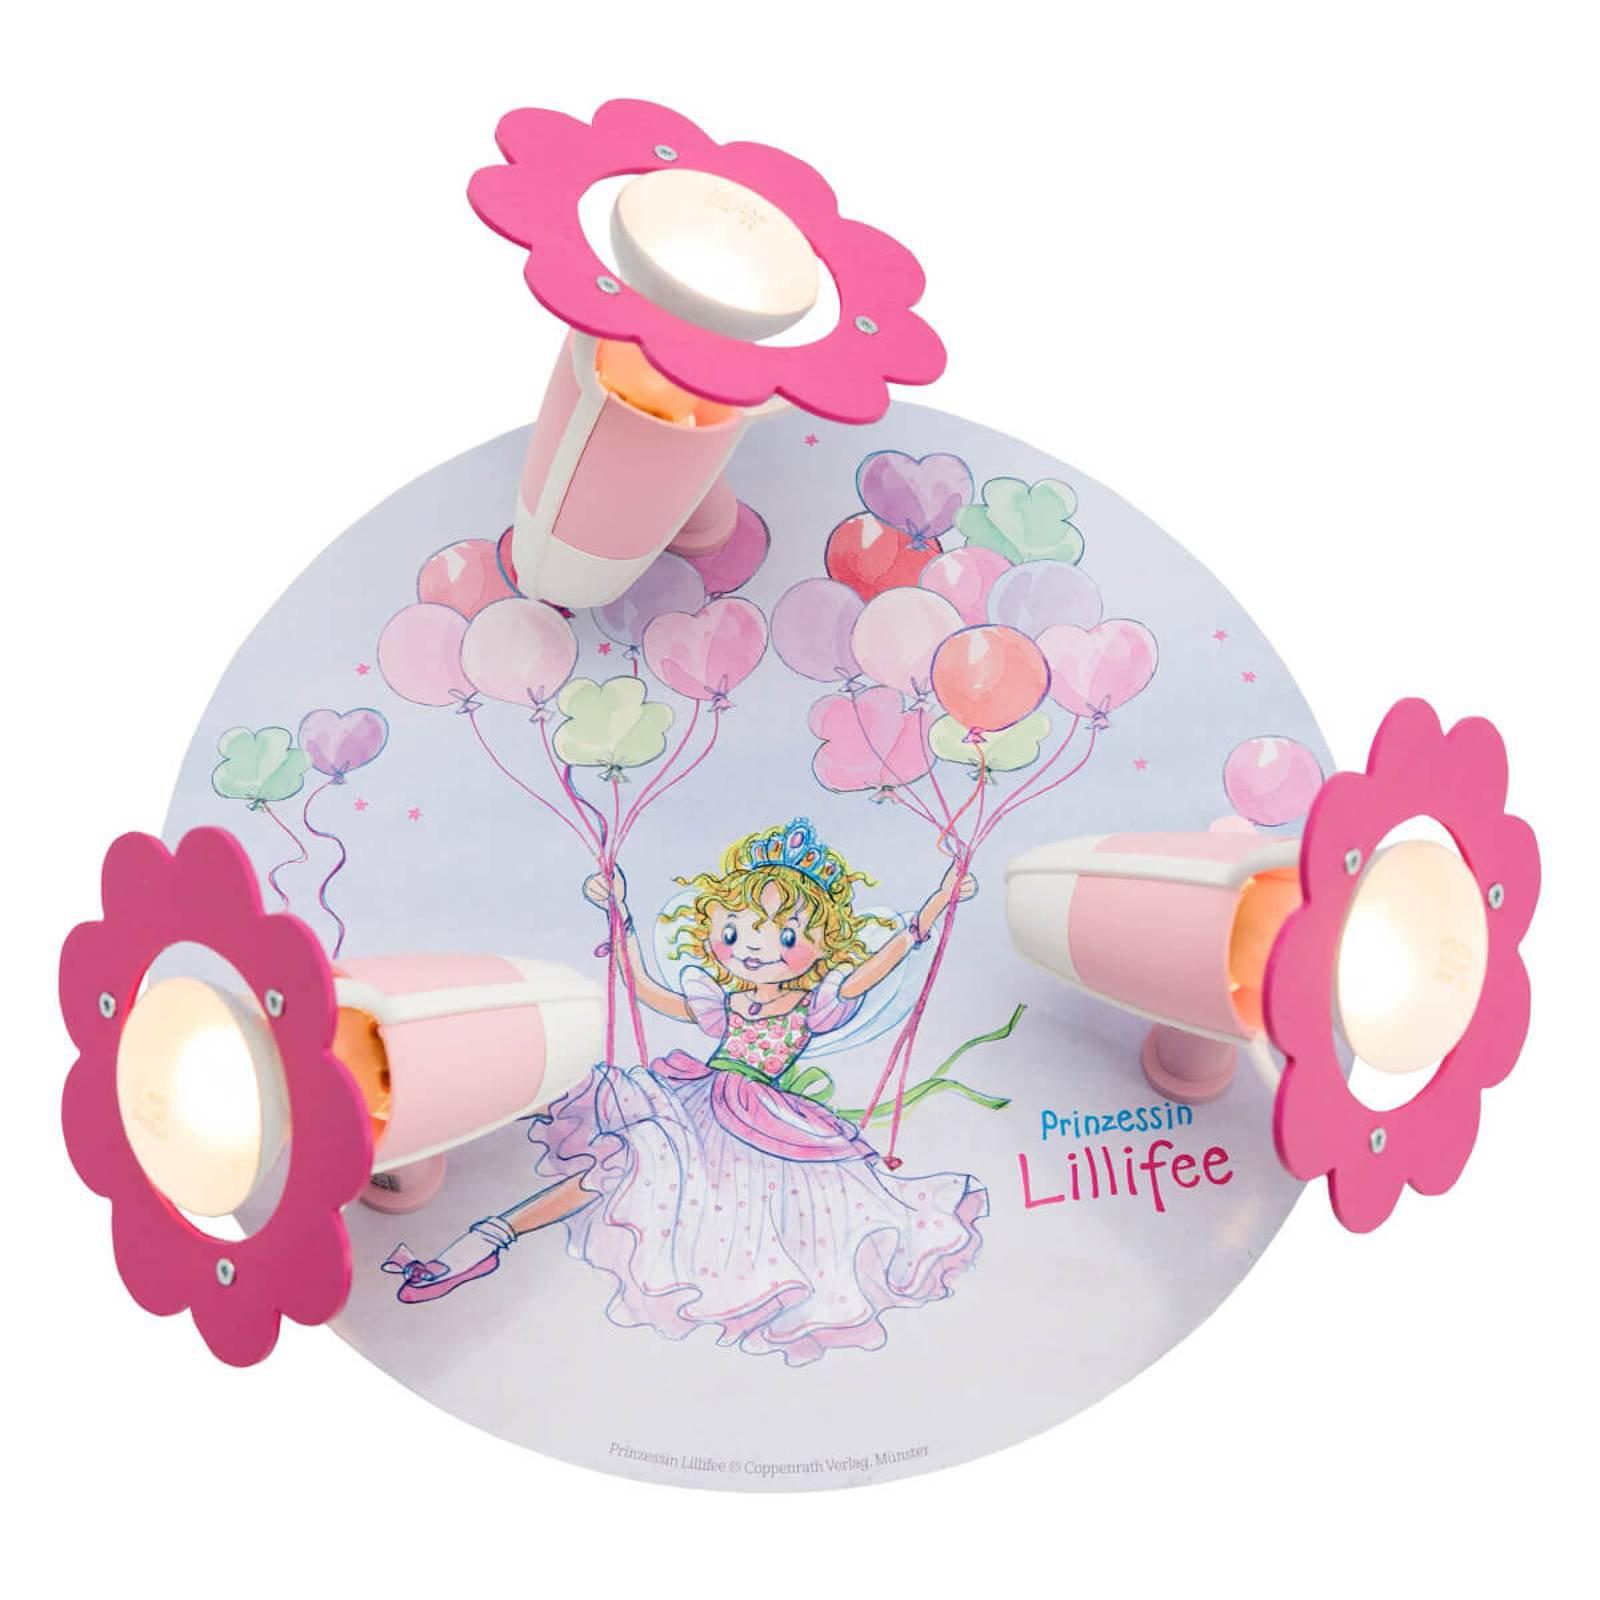 Taklampe Prinsesse Lillifee Rondell, 3 lyskilder